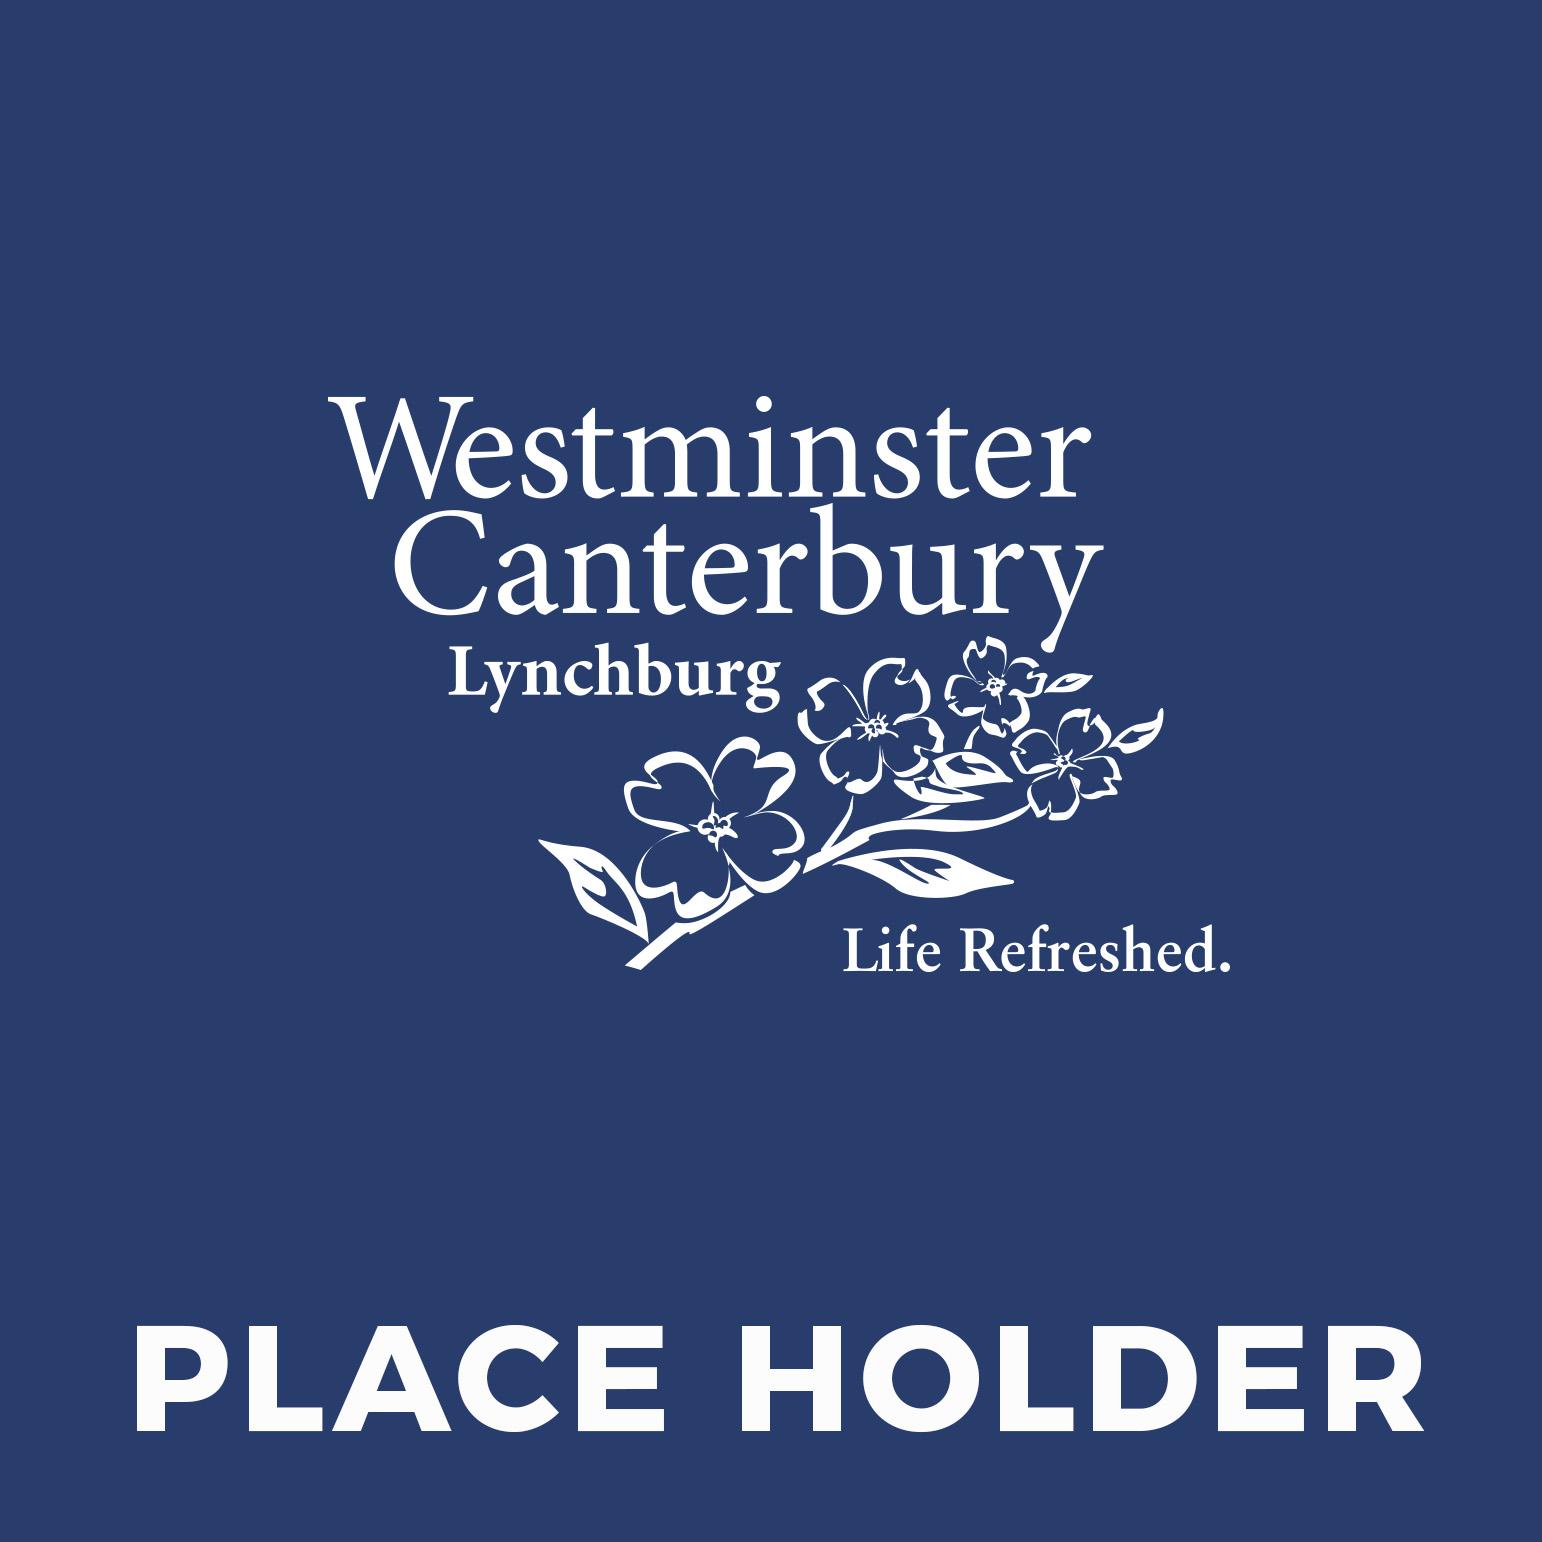 Canterbury Woods Apartments: Westminster Canterbury Of Lynchburg, Virginia